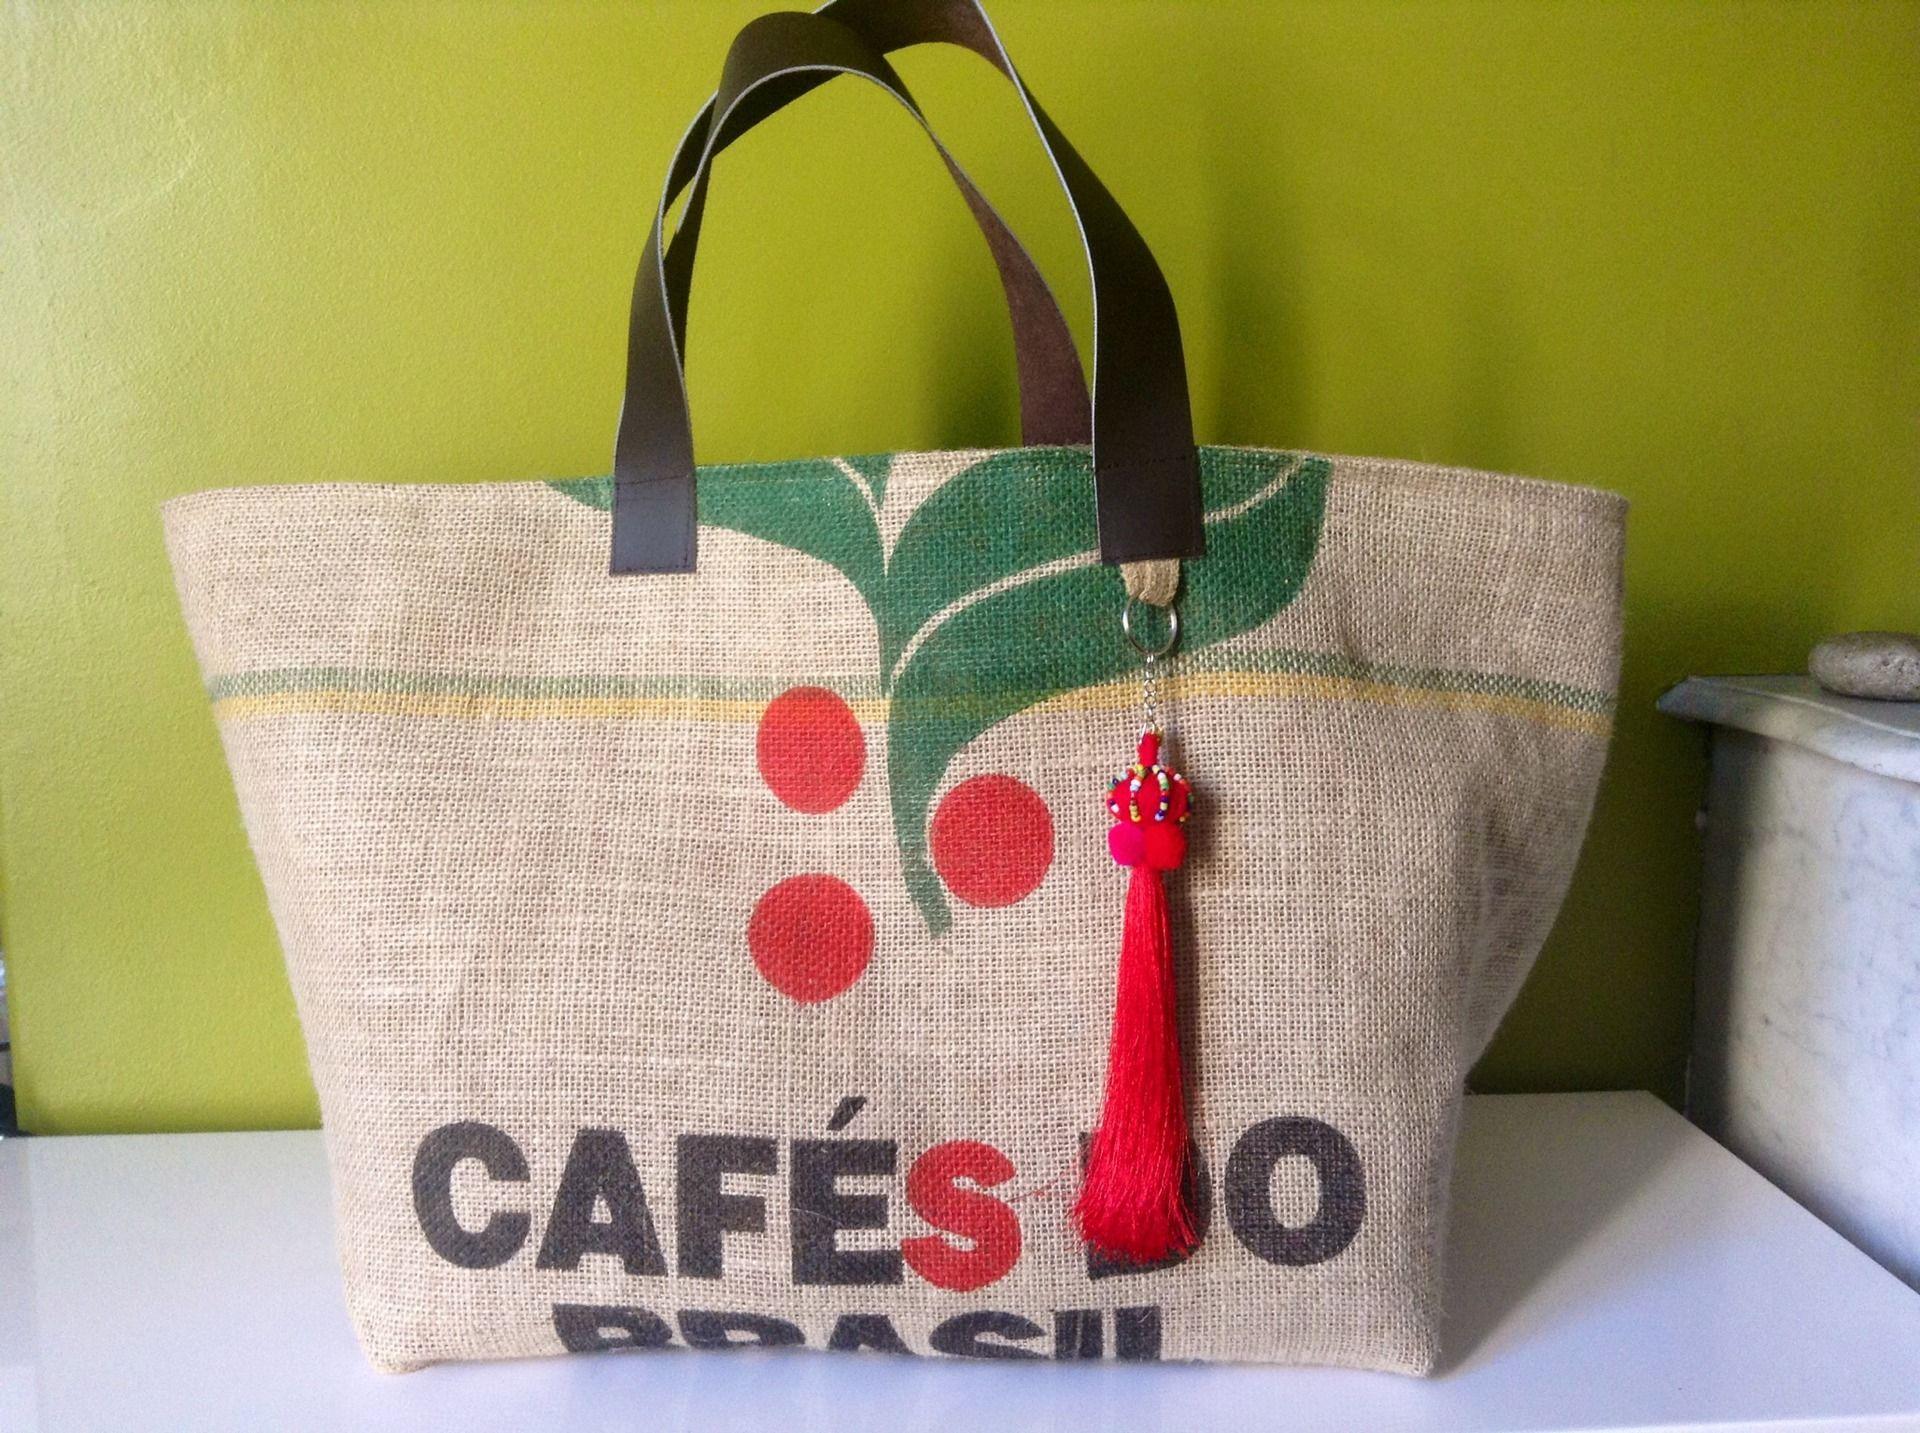 grand sac cabas caf do brasil autres sacs par bo comptoir couture pinterest. Black Bedroom Furniture Sets. Home Design Ideas